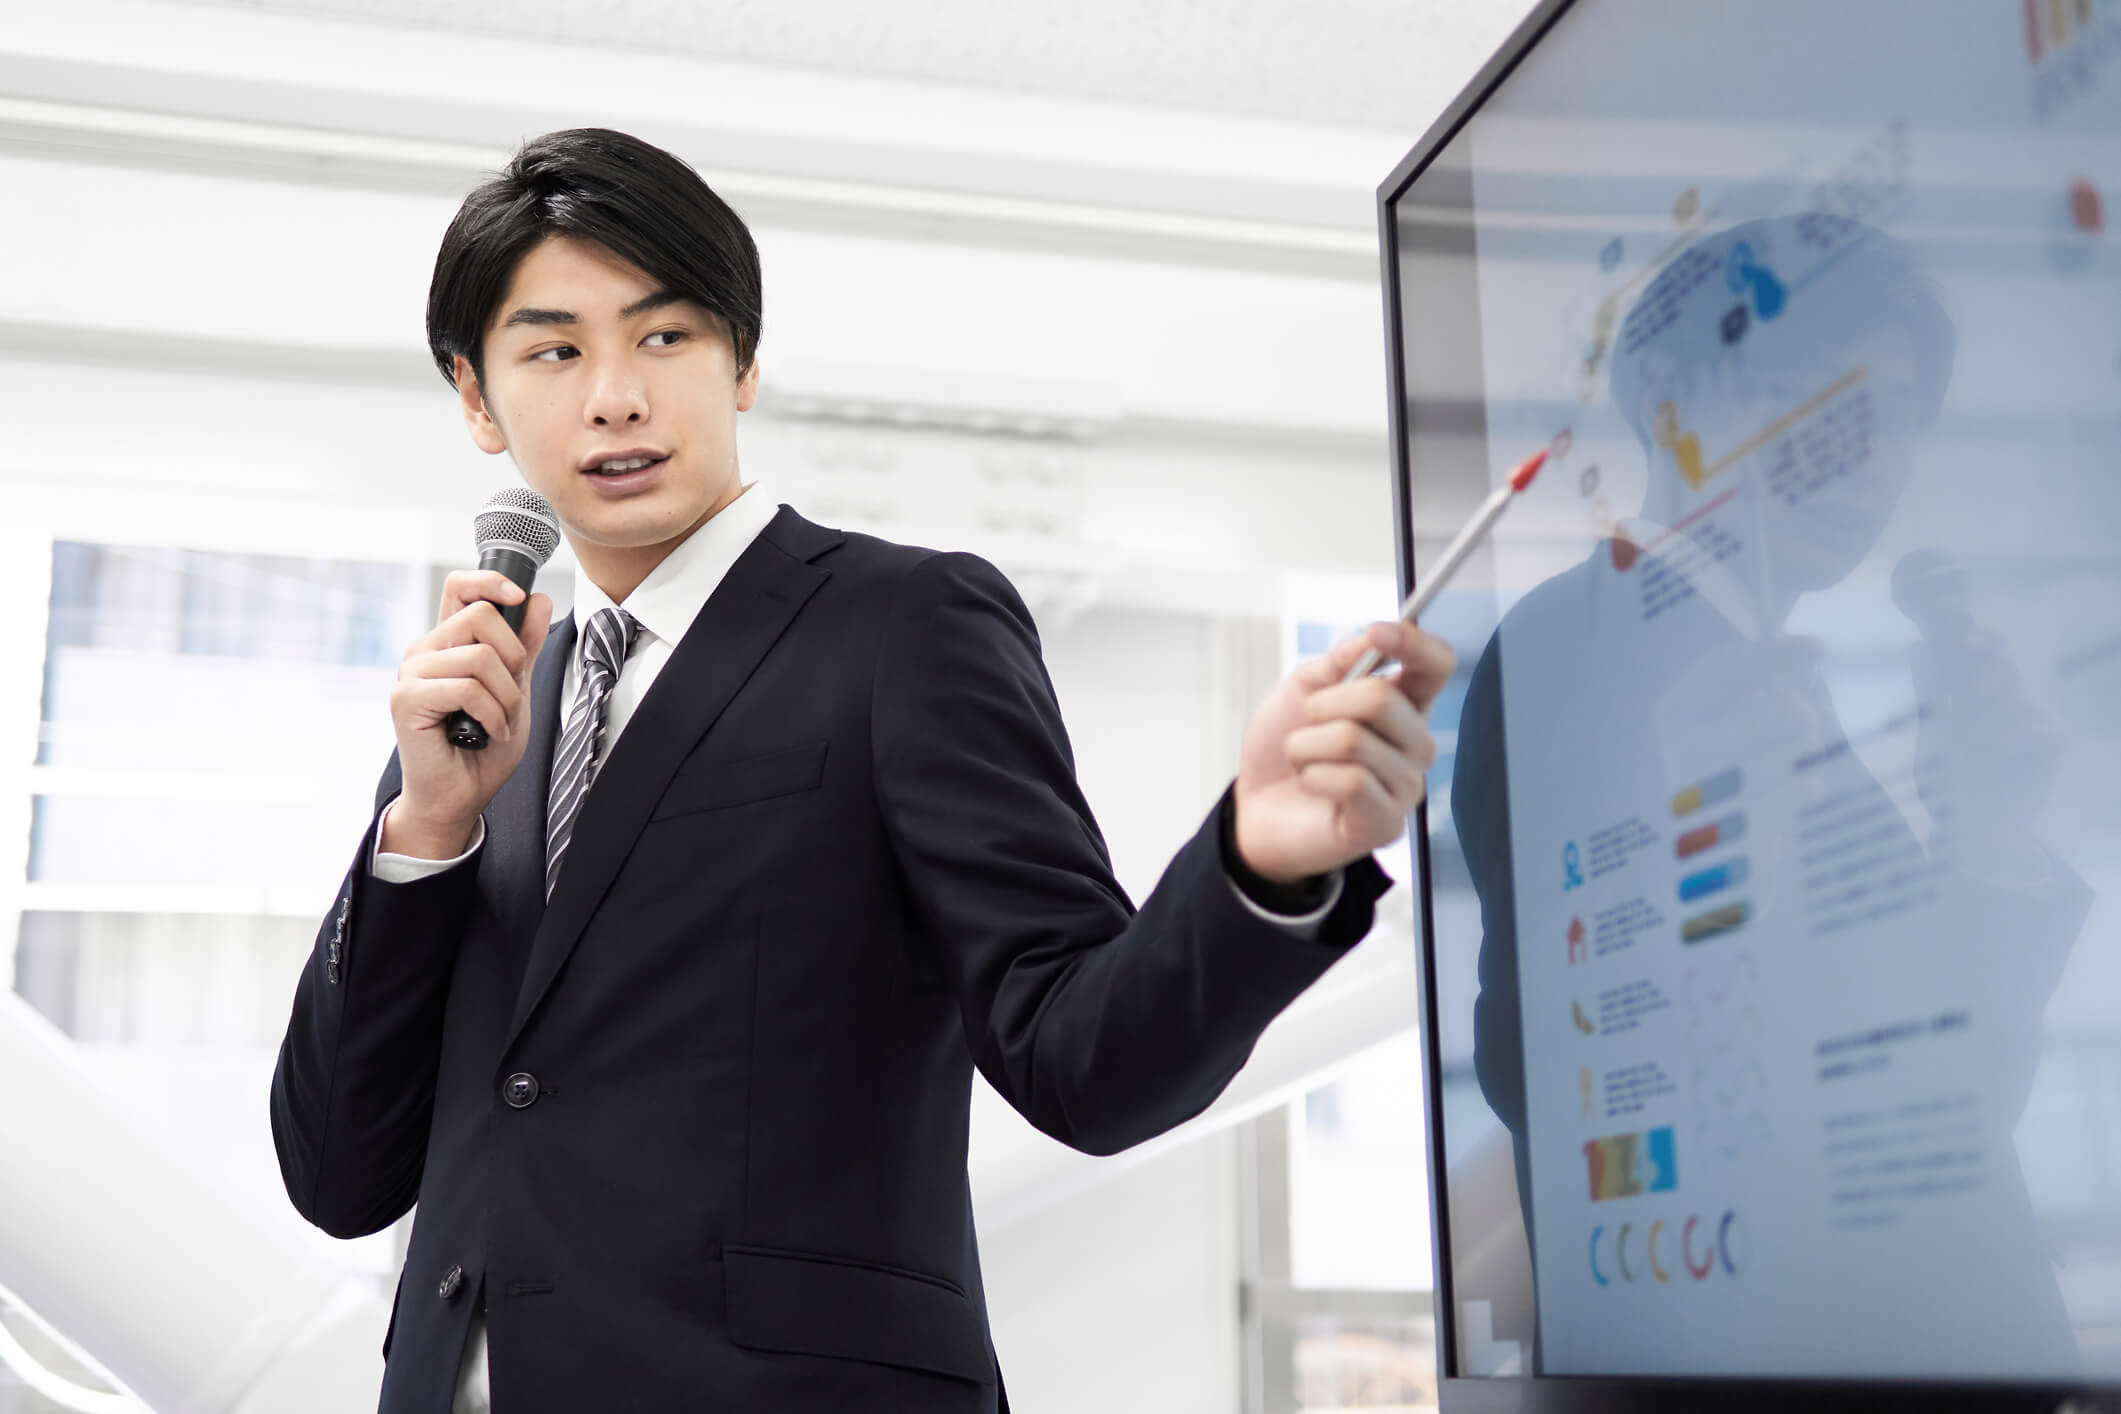 why Japanese don't like training seminars